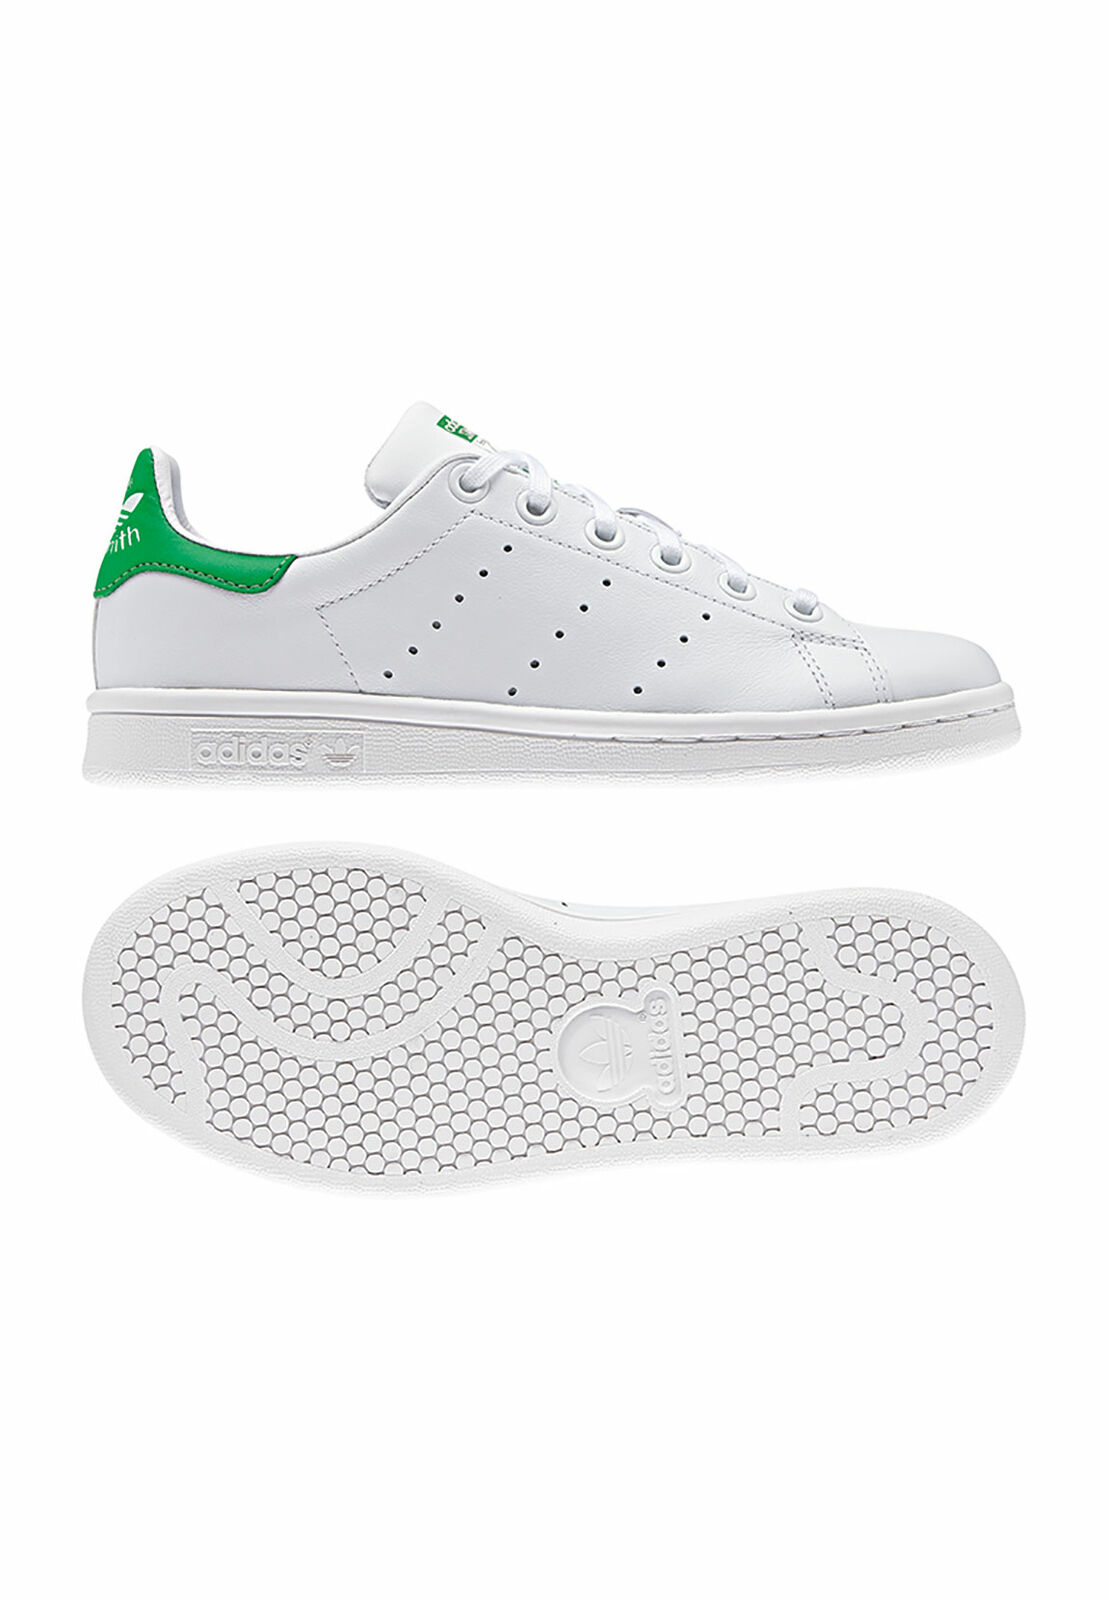 Adidas Originals Sneaker Stan Smith J M20605 White Green